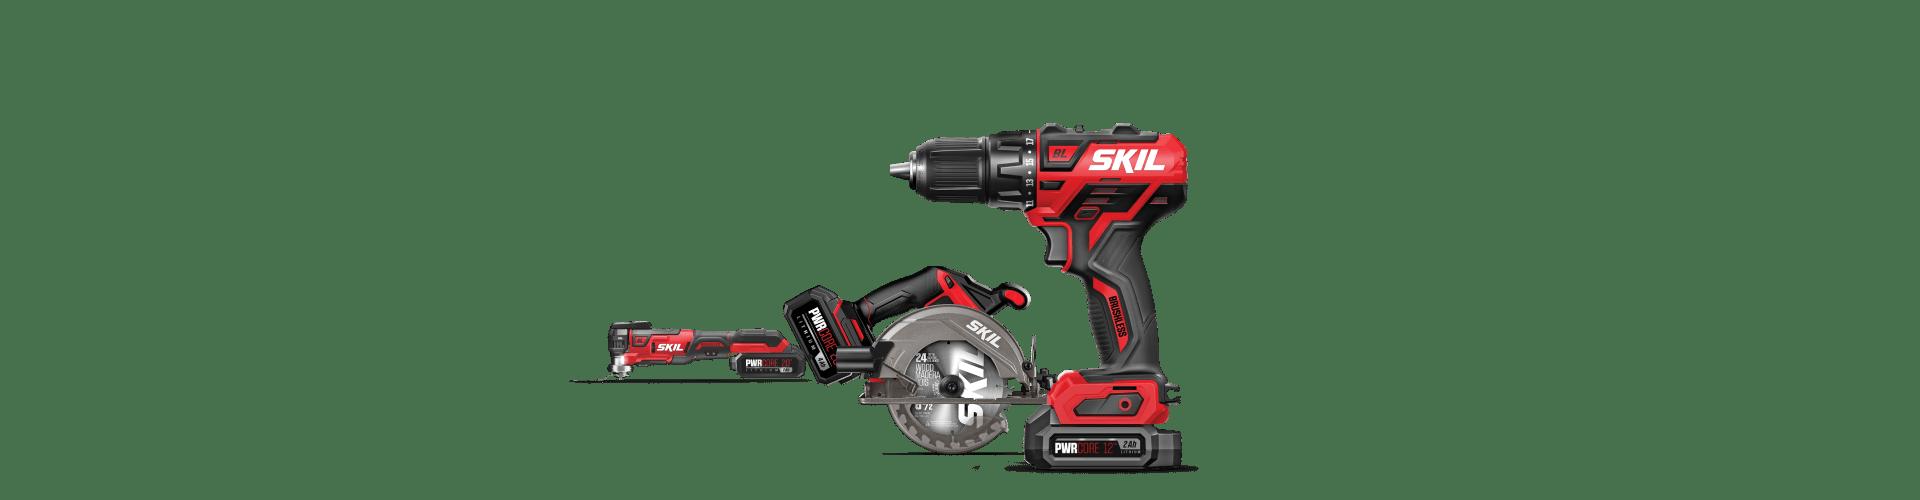 SKIL 12V Drill Driver, 20V Circ Saw and 20V Multi-Oscillating Tool